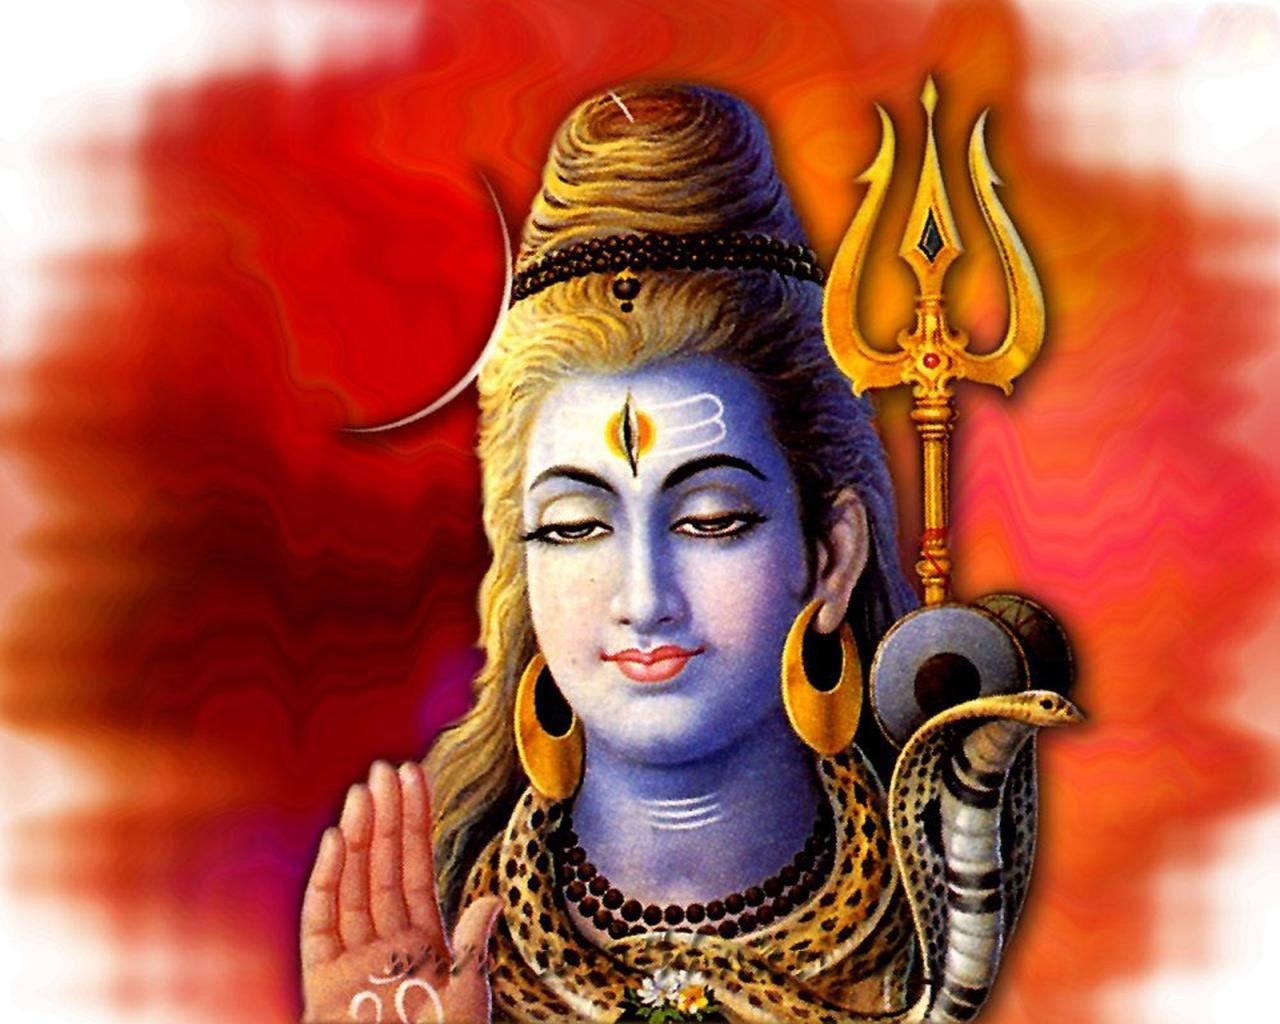 Mahadev Lord Shiva New Hd Desktop